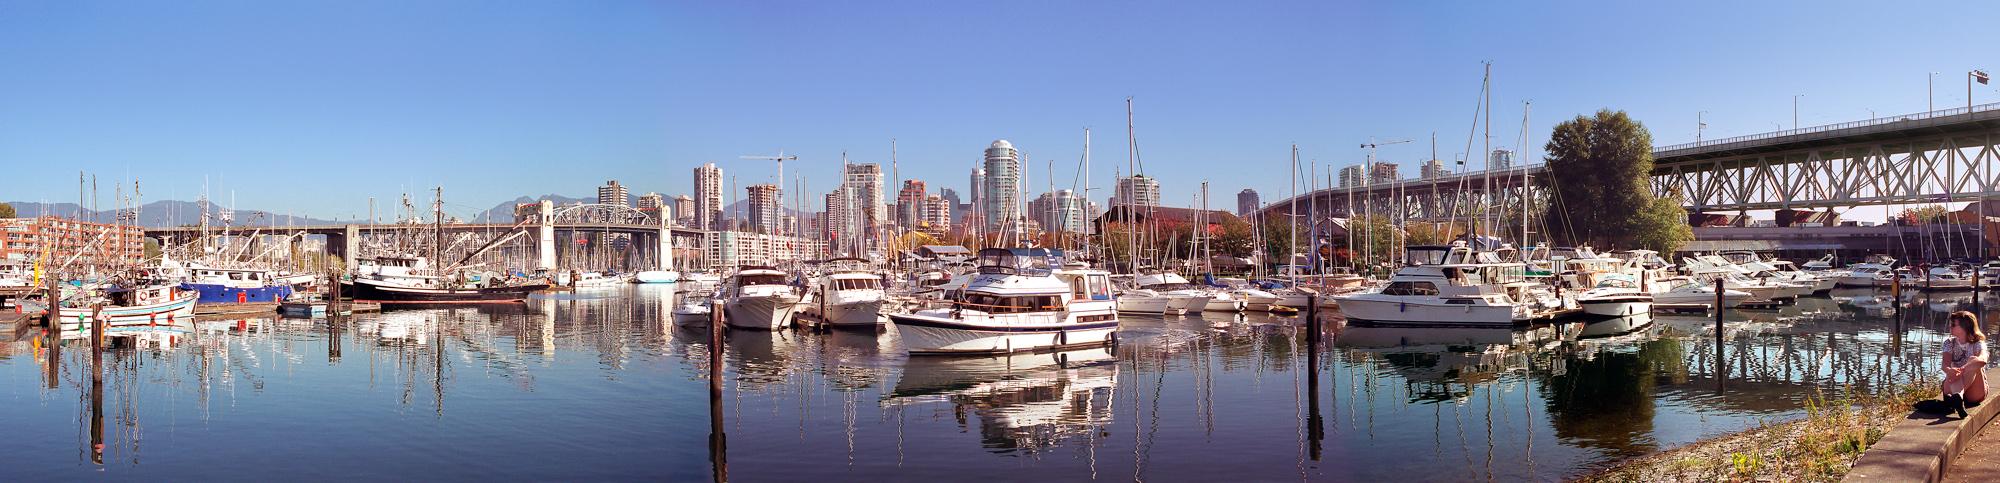 Fisherman's Wharfe, Vancouver